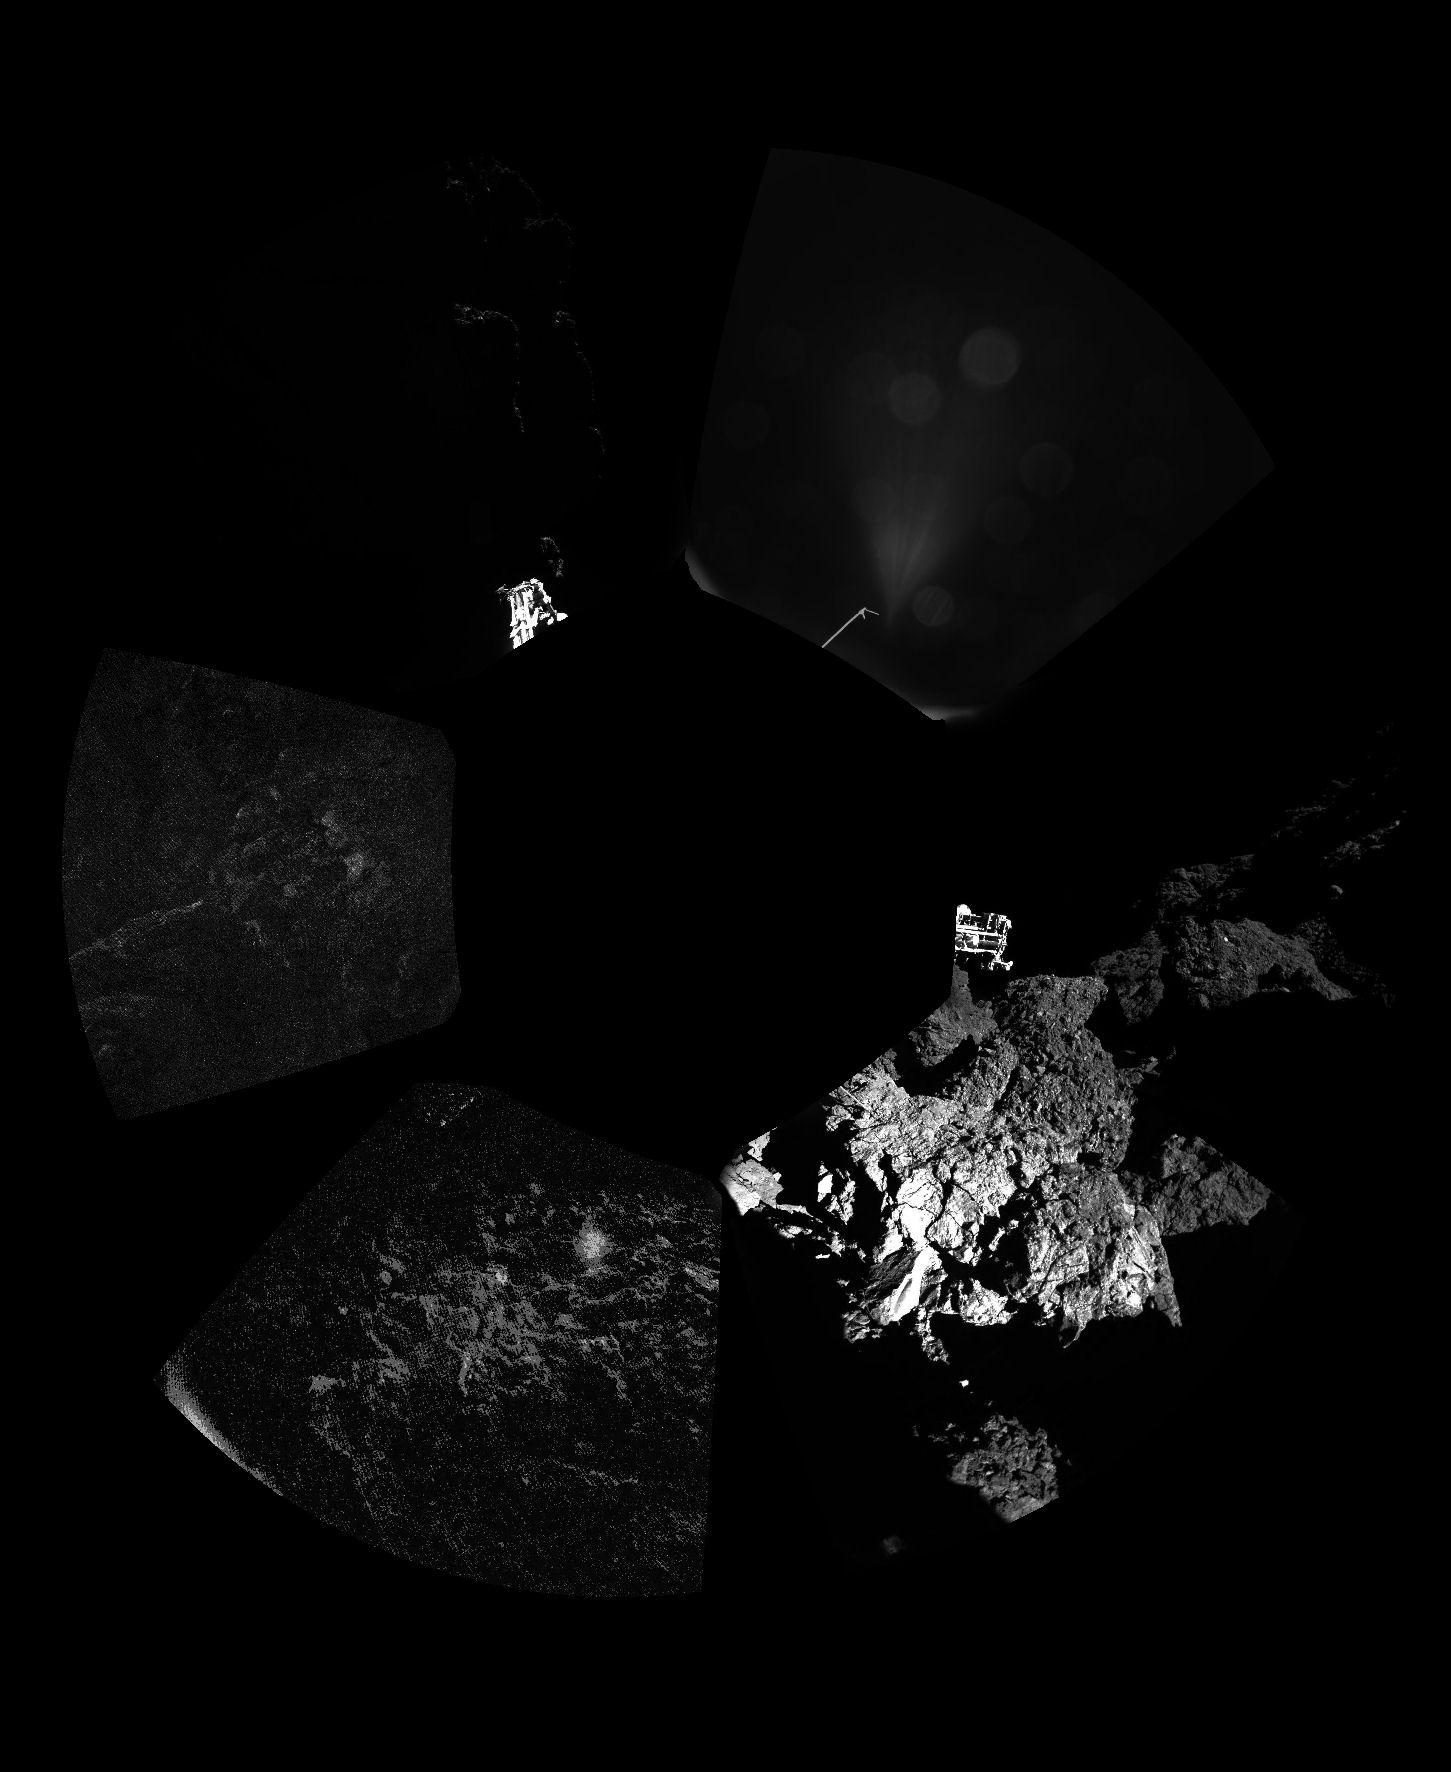 nasa comet lander name - photo #22